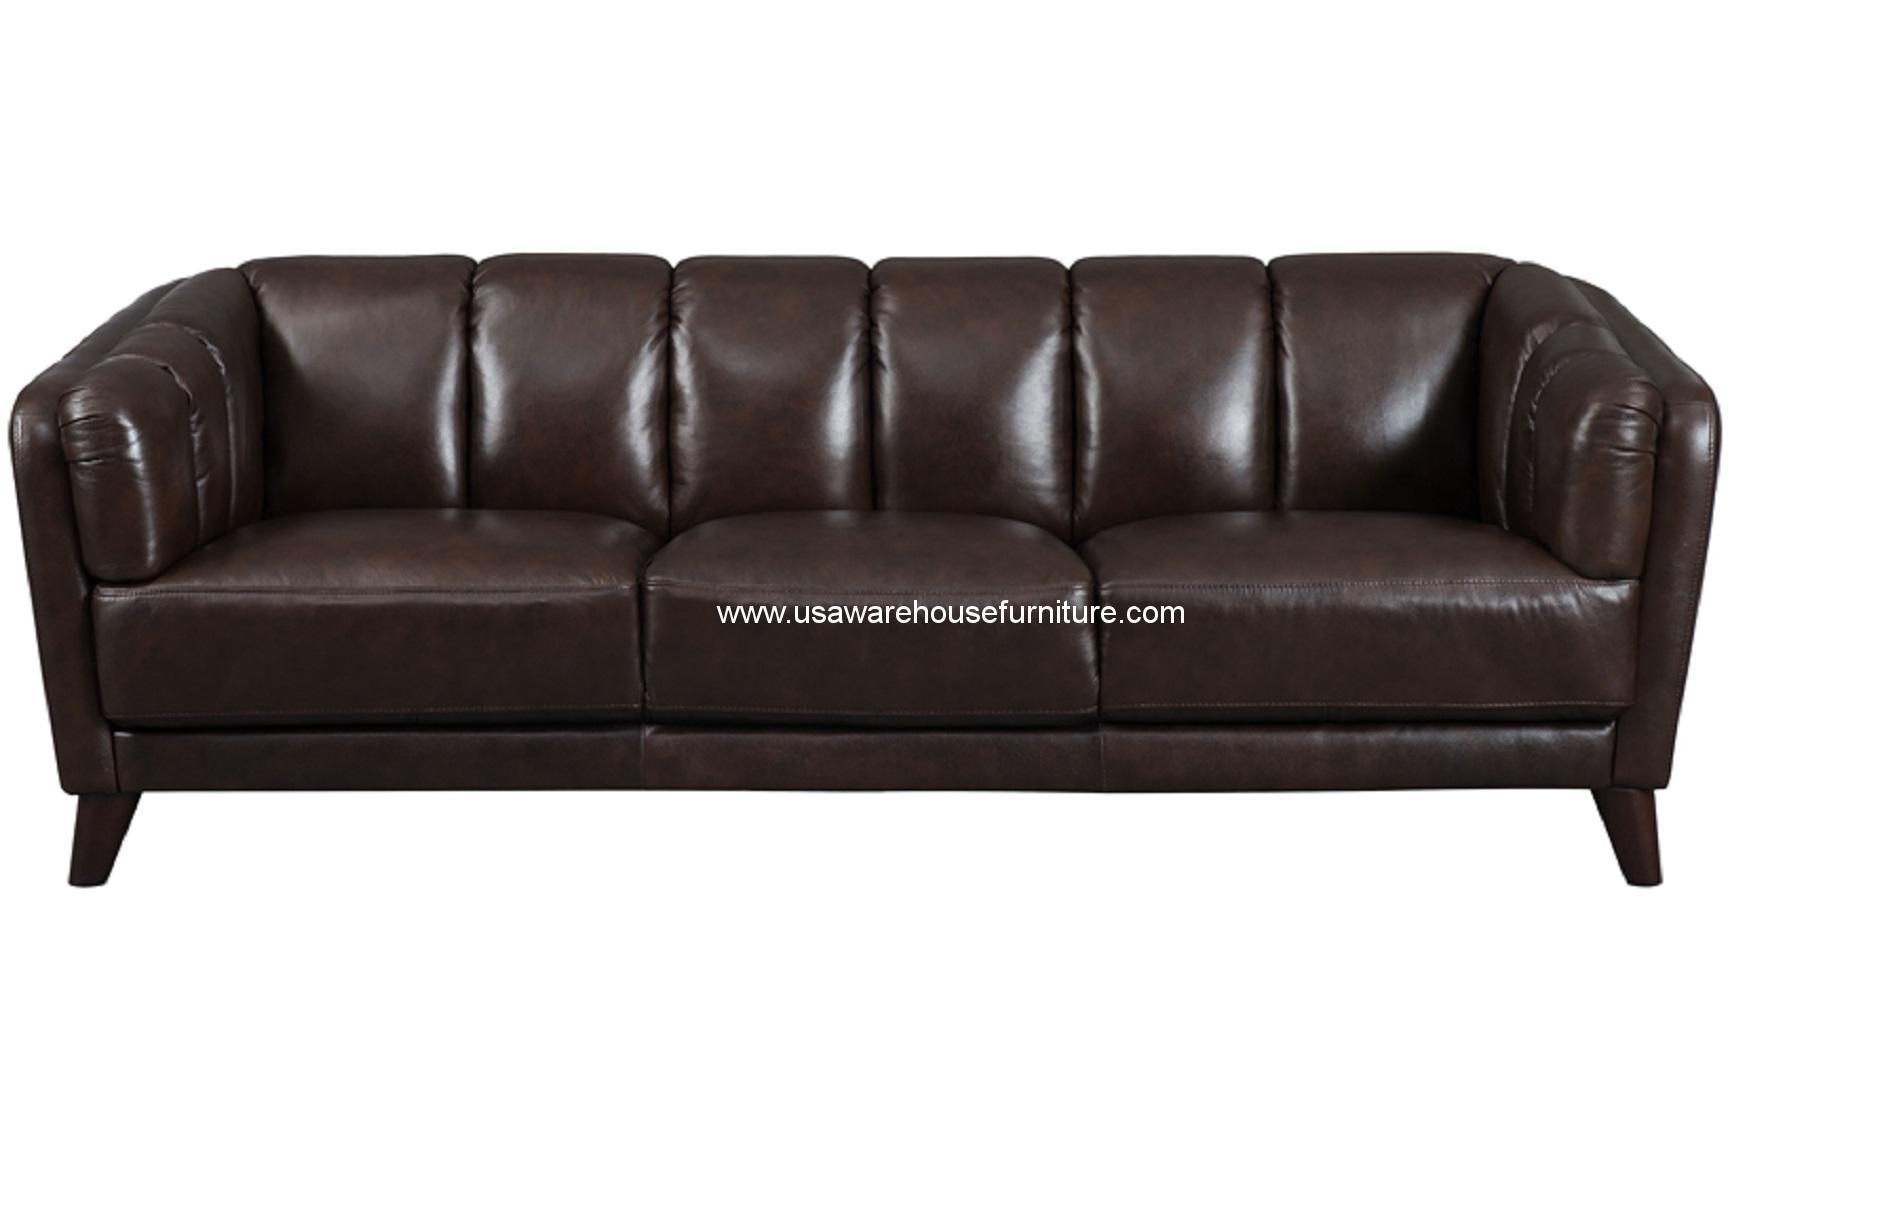 frances dark brown full top grain leather sofa usa warehouse furniture. Black Bedroom Furniture Sets. Home Design Ideas